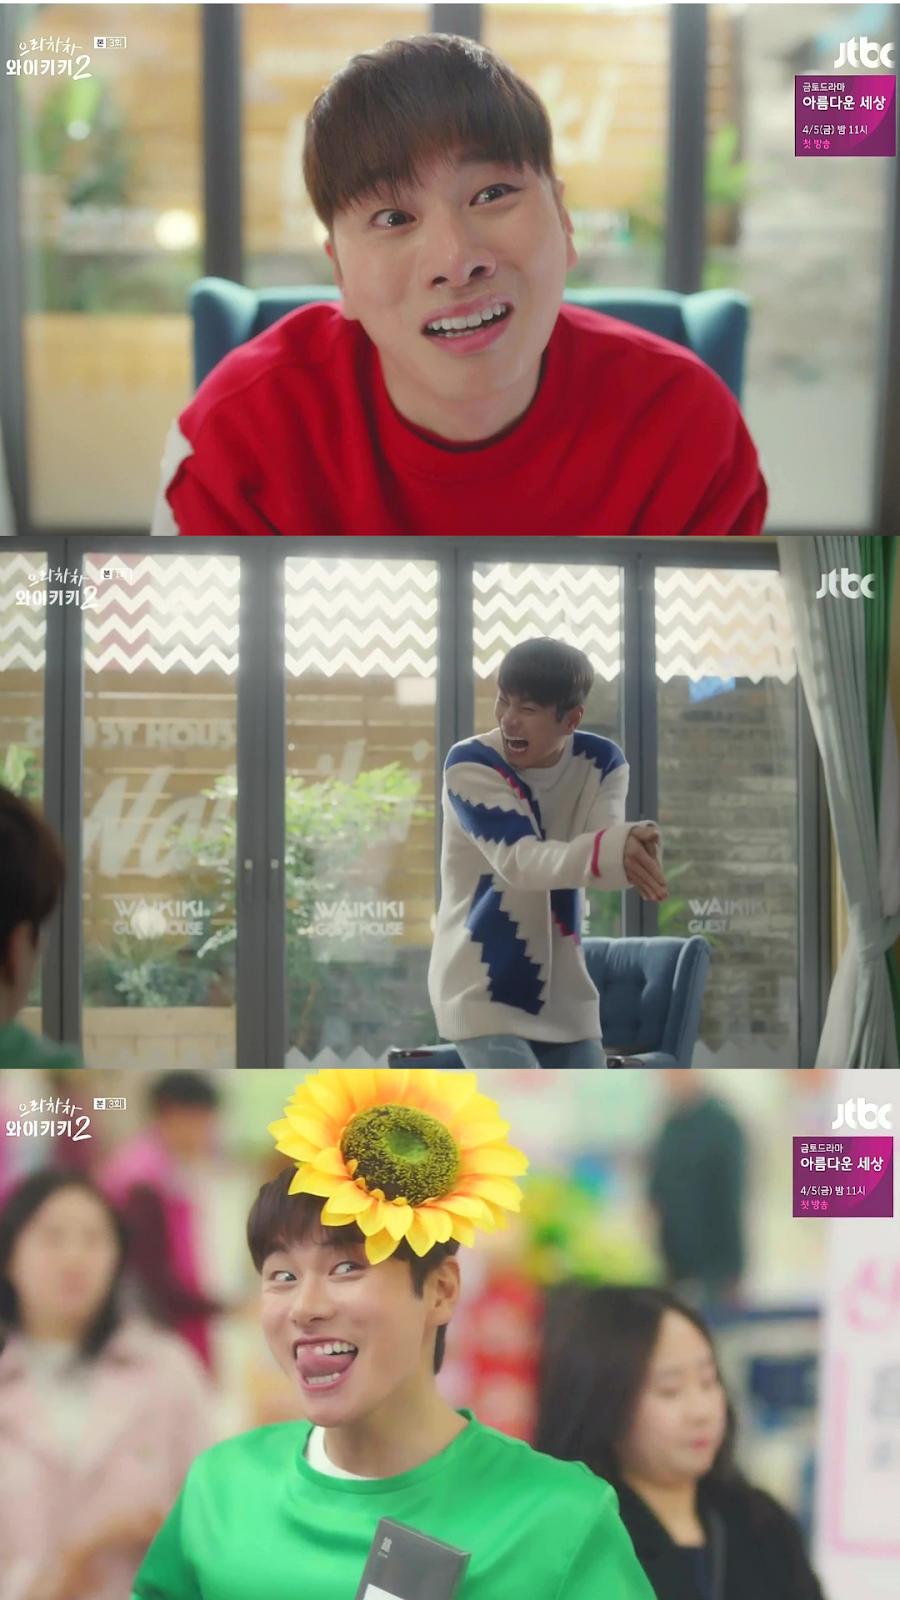 kesan pertama nonton drama korea eulachacha waikiki